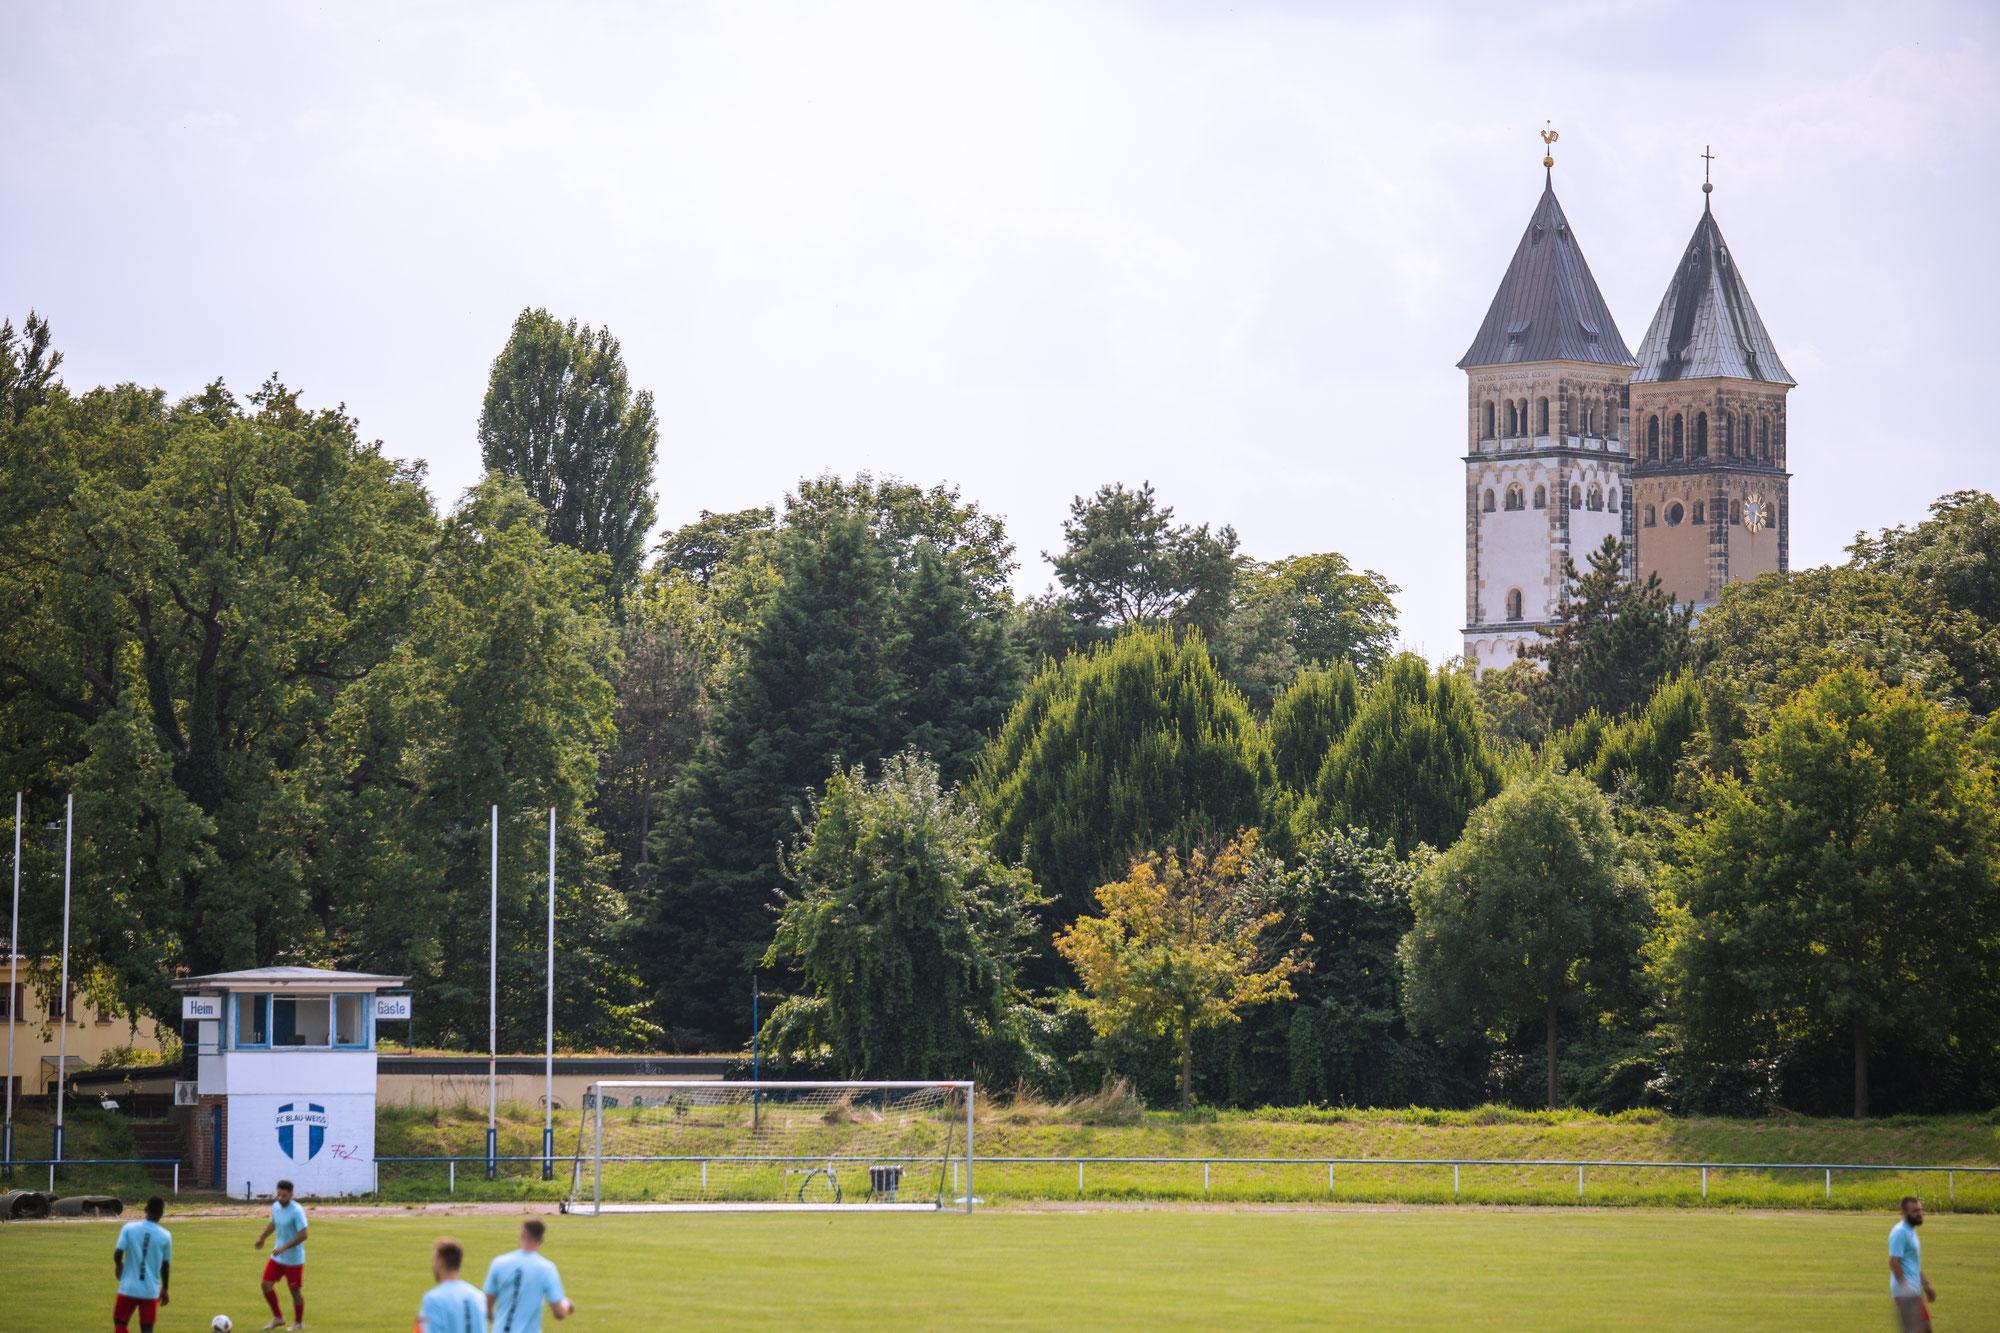 Groundhopping: FC Blau-Weiß Leipzig vs. SV Dessau